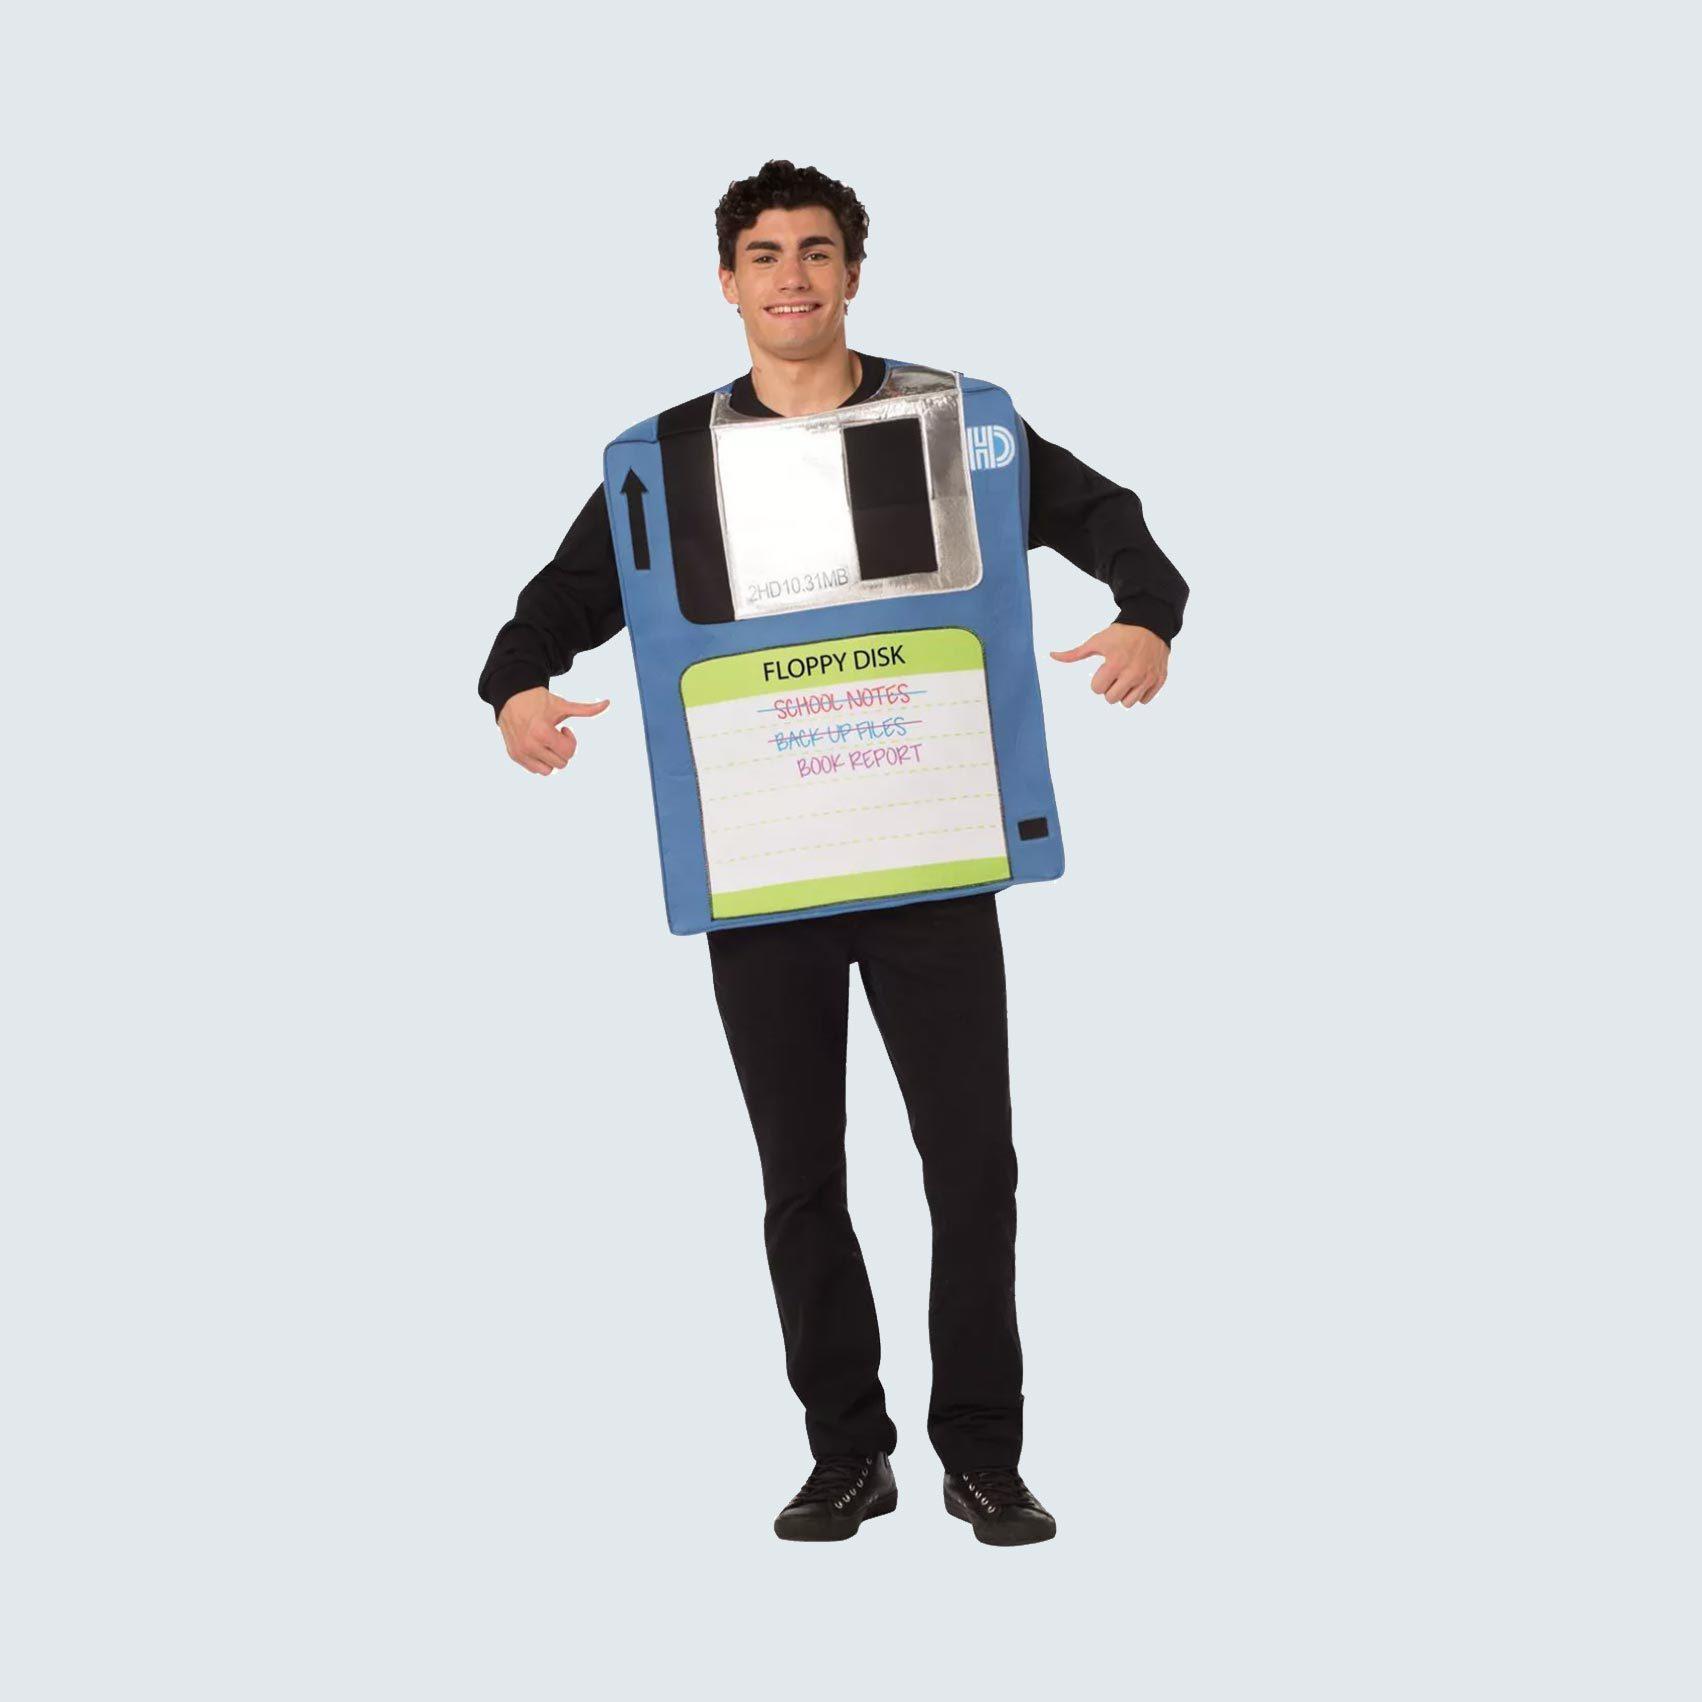 Man dressed as floppy disk